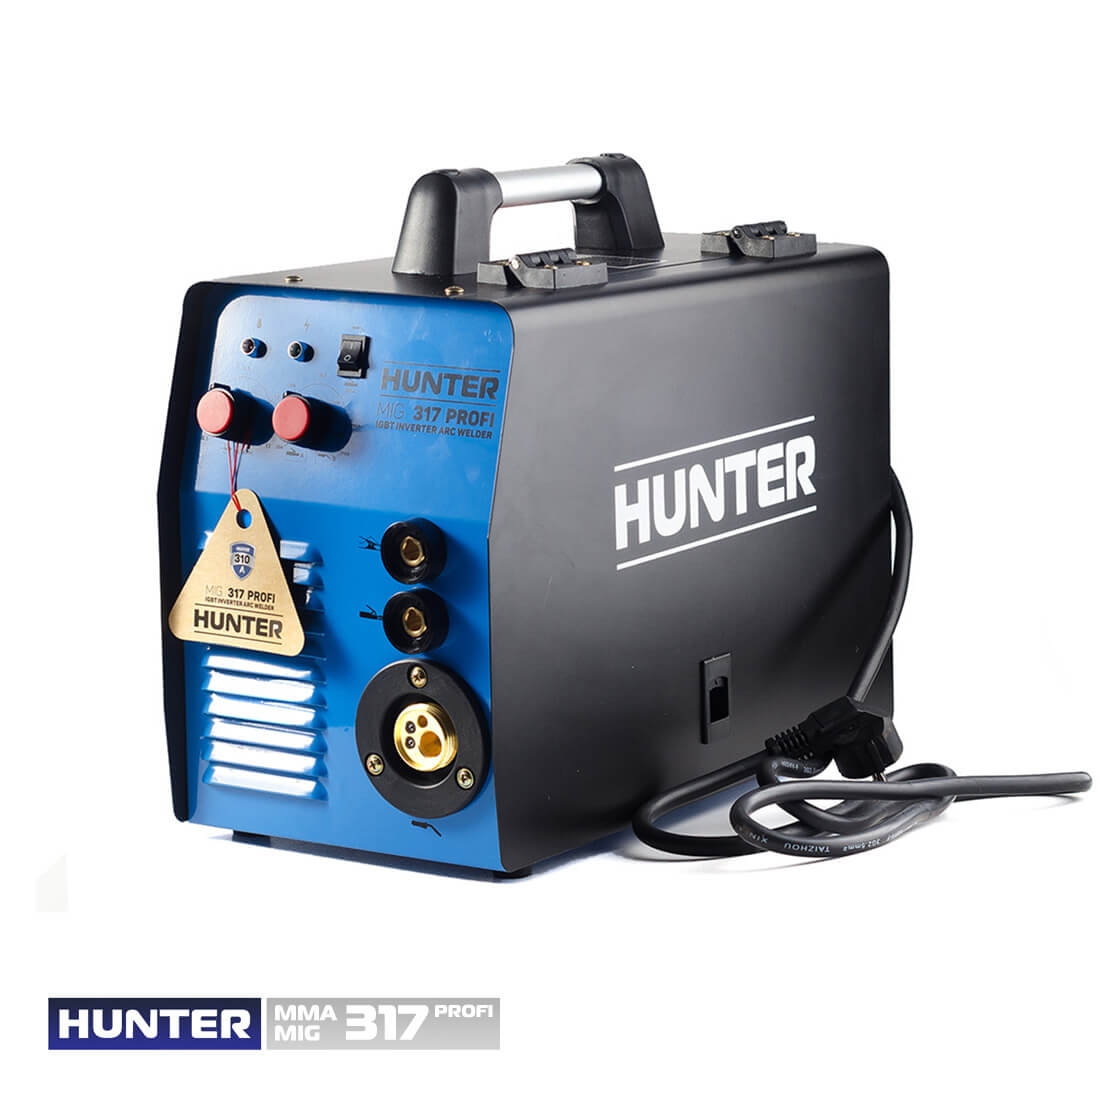 Фото Hunter MIG/MMA 317 (напівавт.+дуговий) цена 6075грн №1 — Hunter